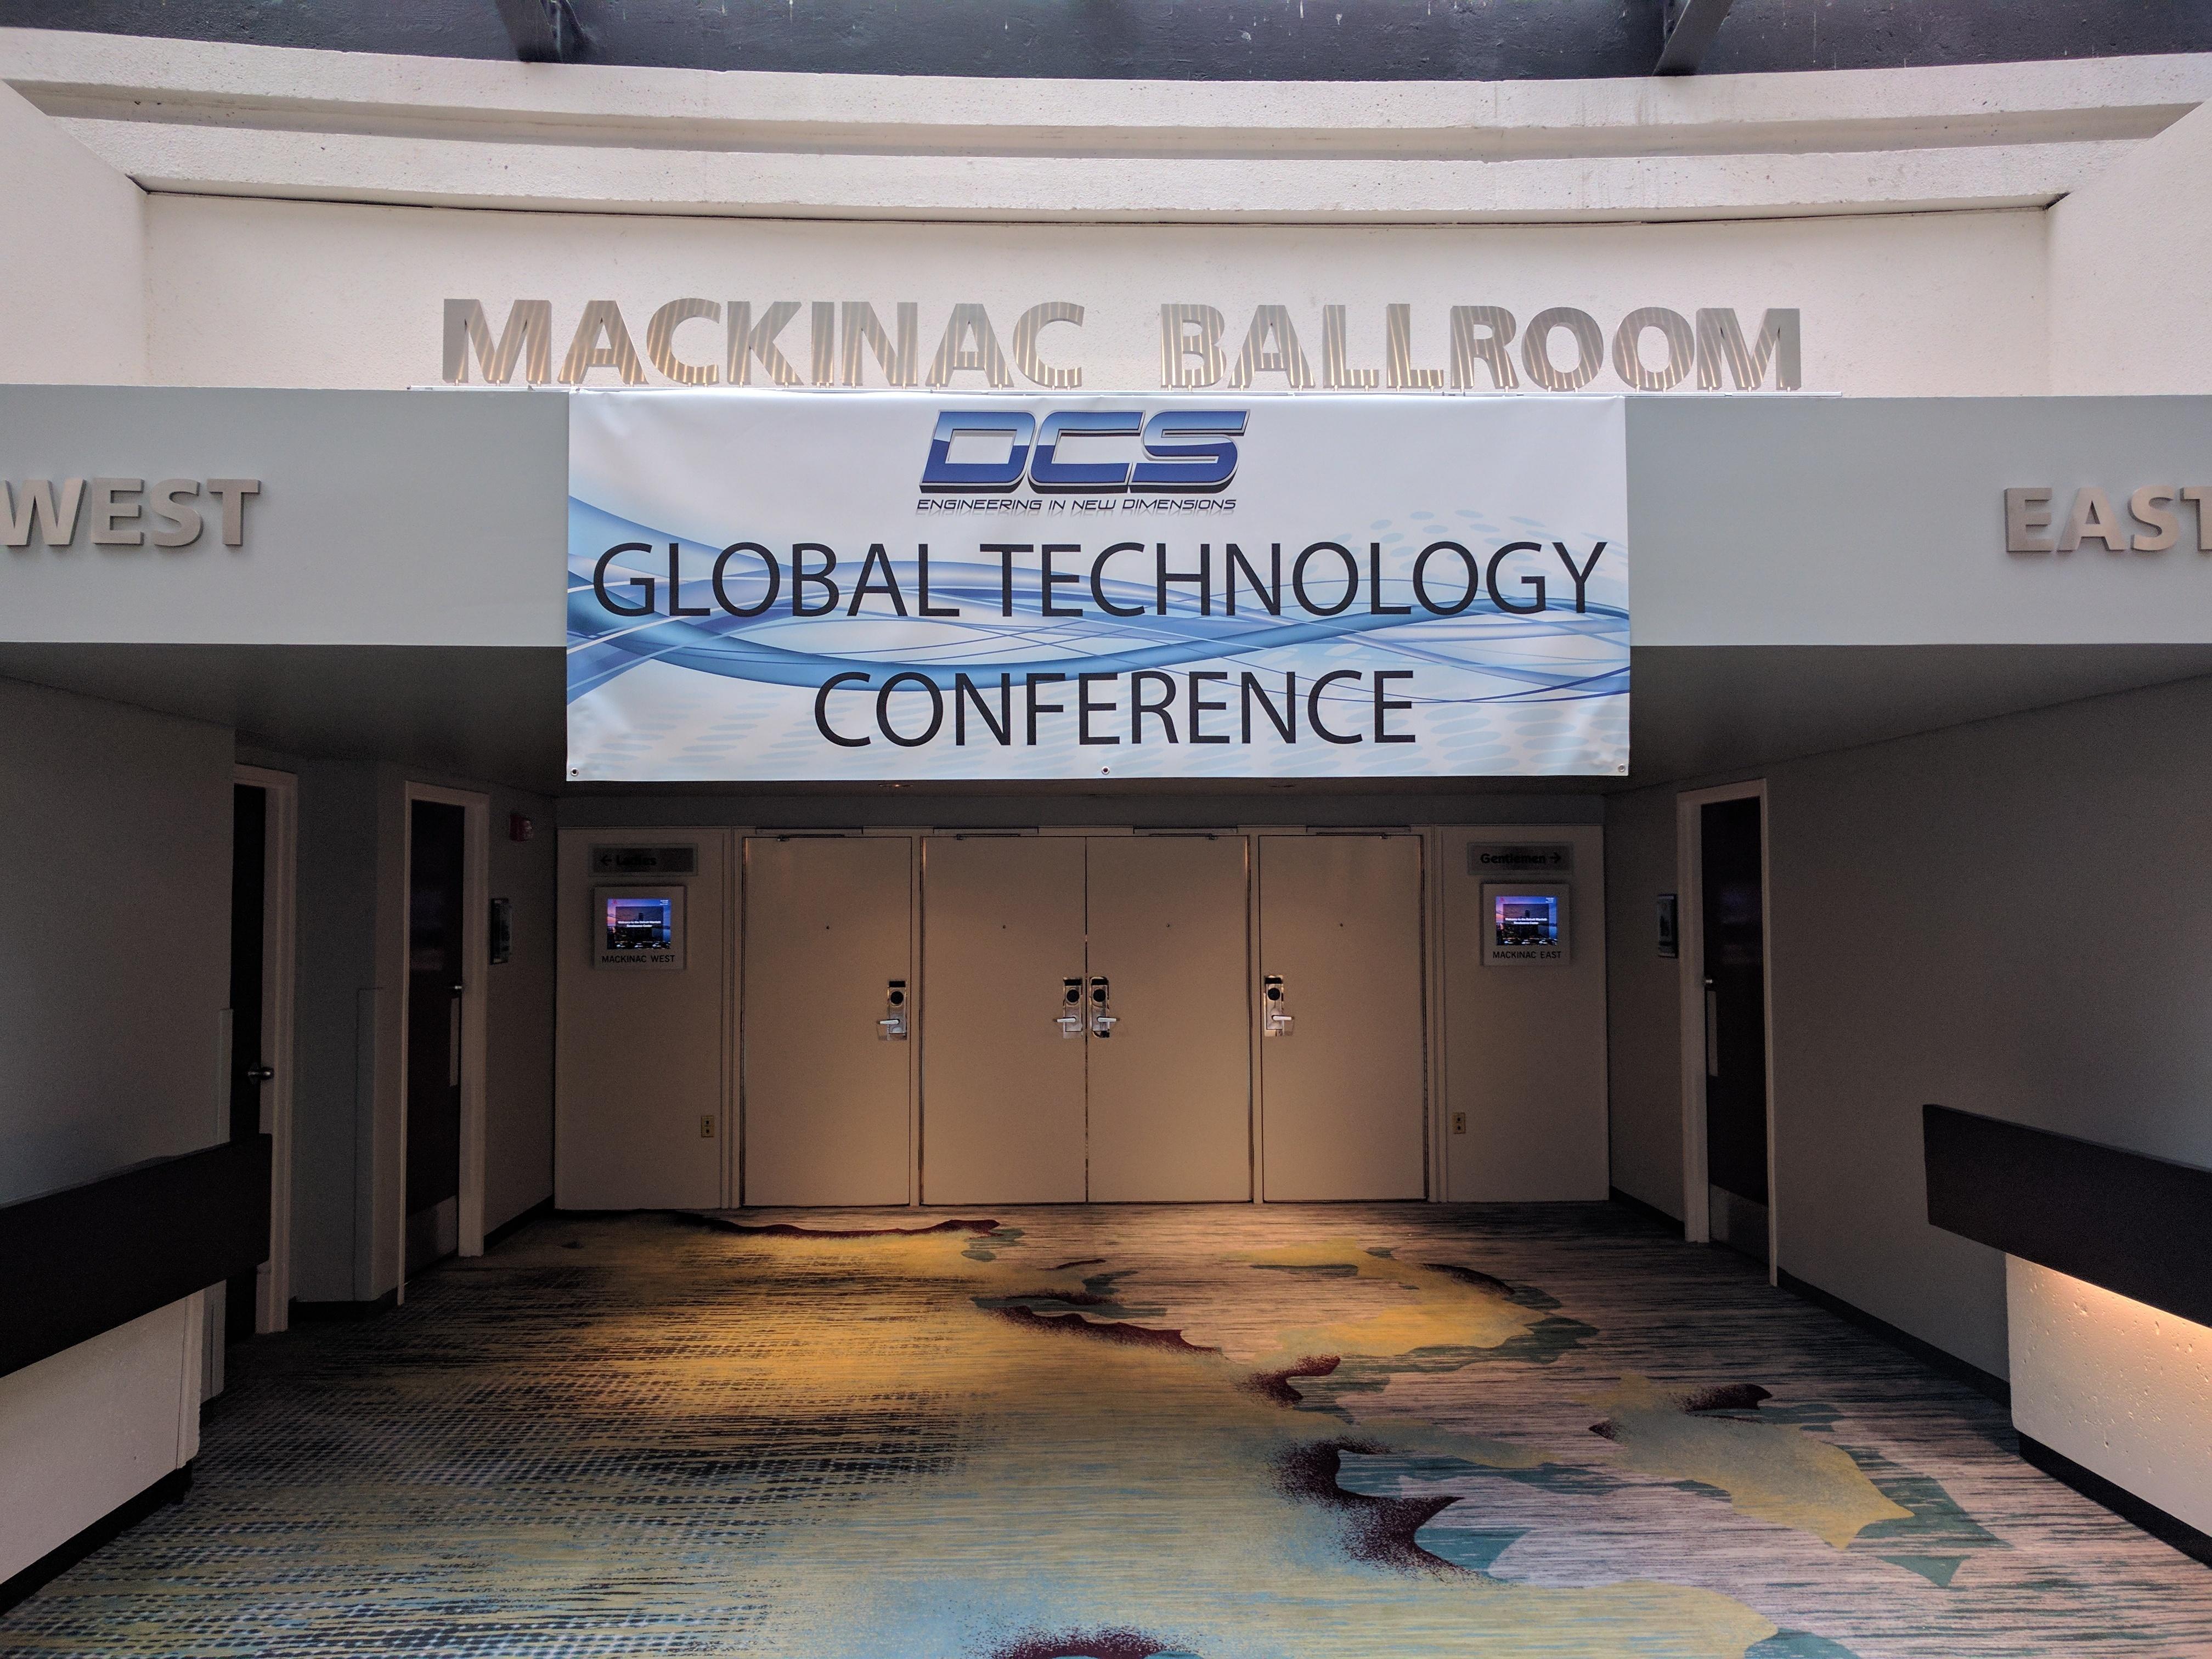 Global-Technology-Conference-Banner.jpg